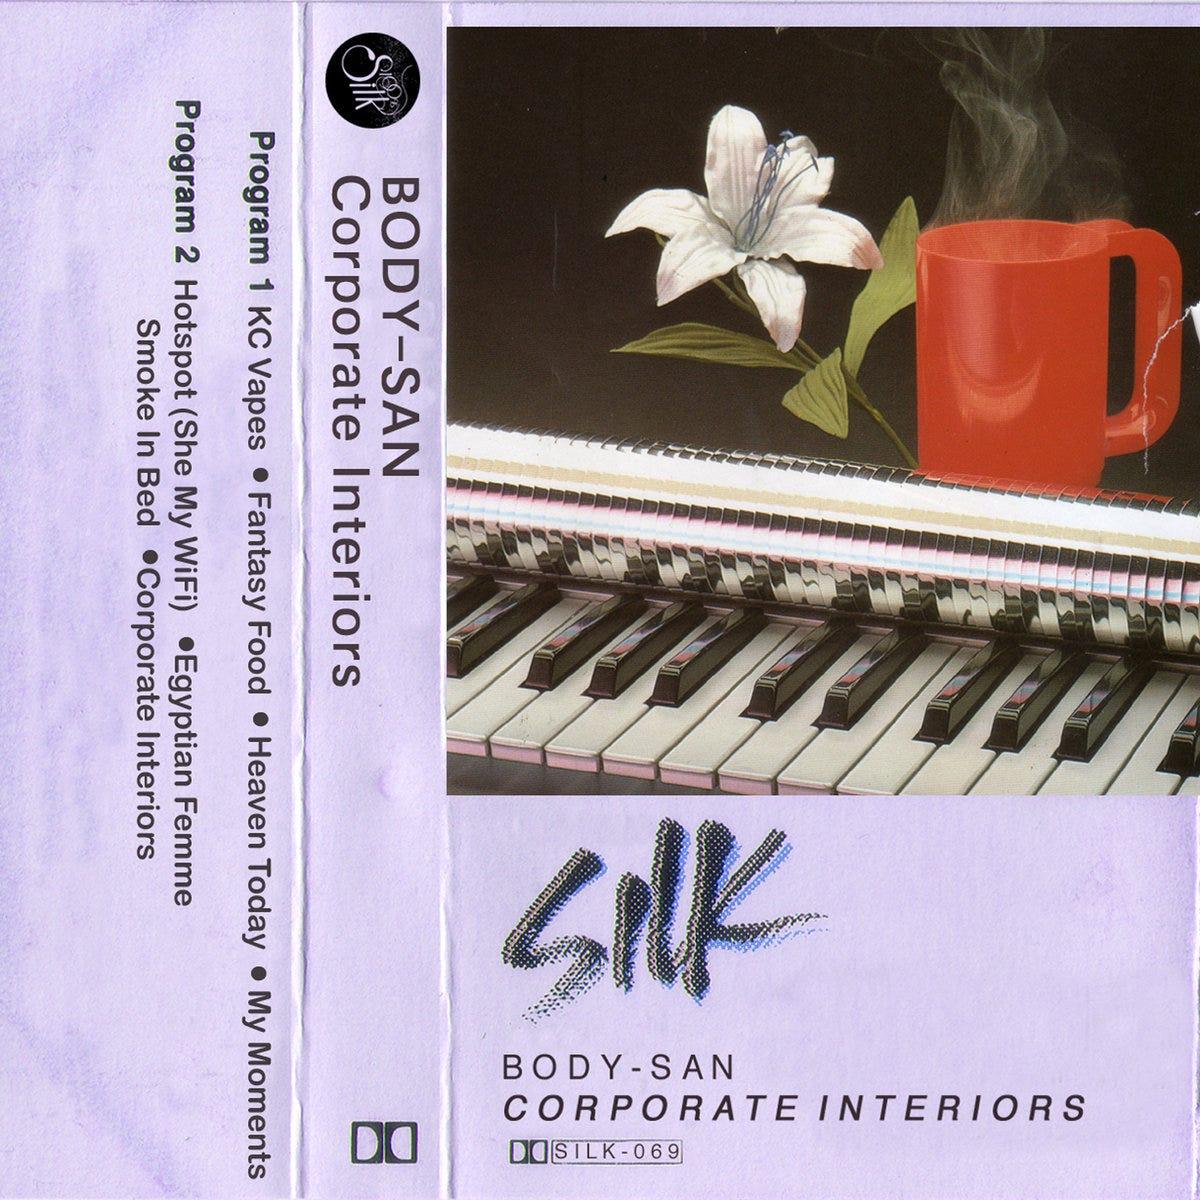 Corporate Interiors | Body San